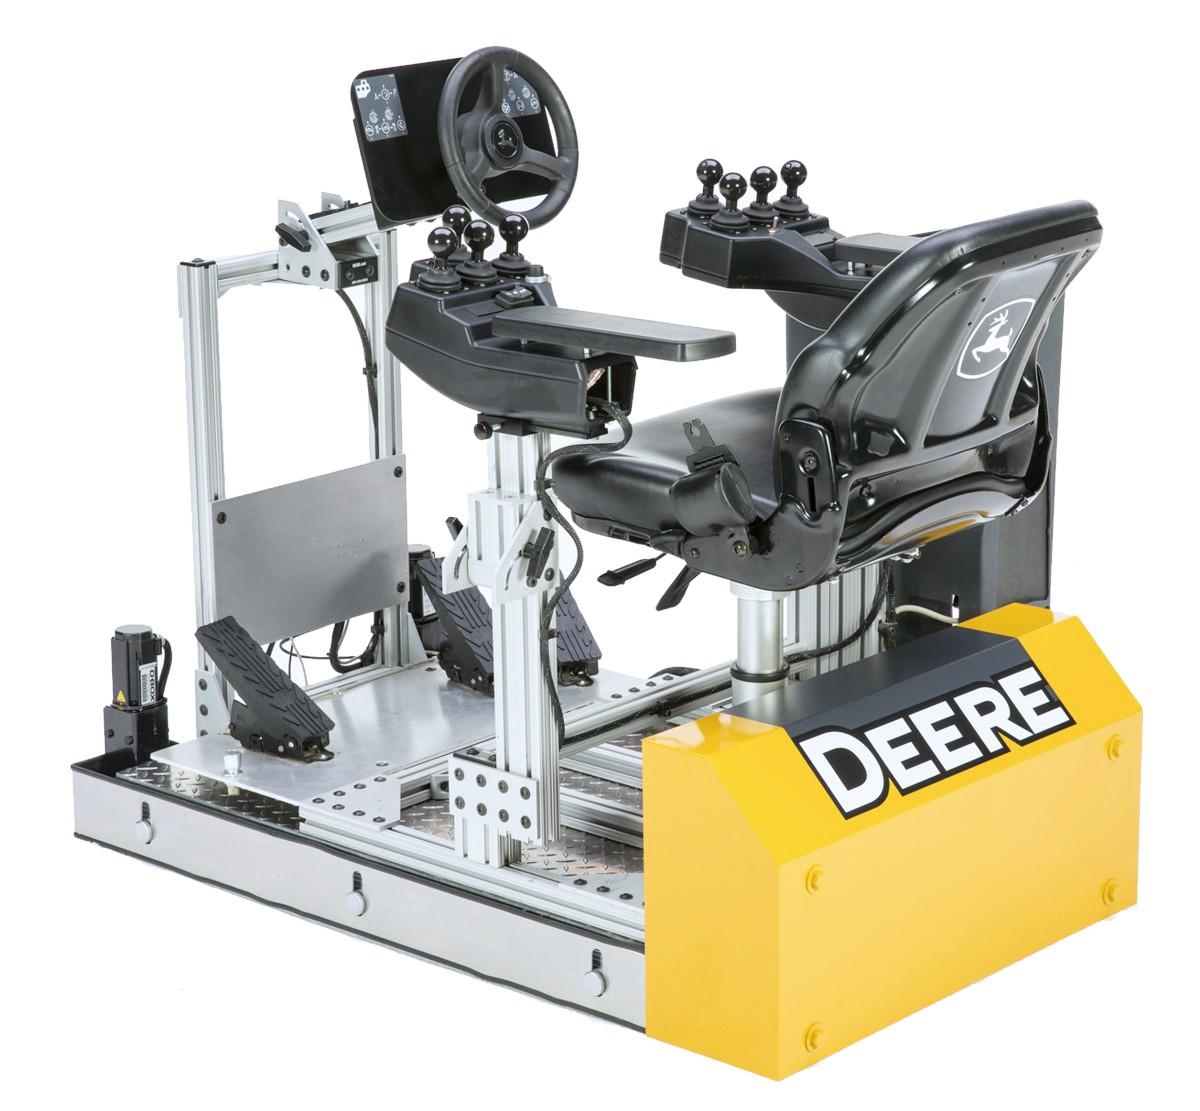 John Deere delivers revolutionary hi-tech simulator operator training